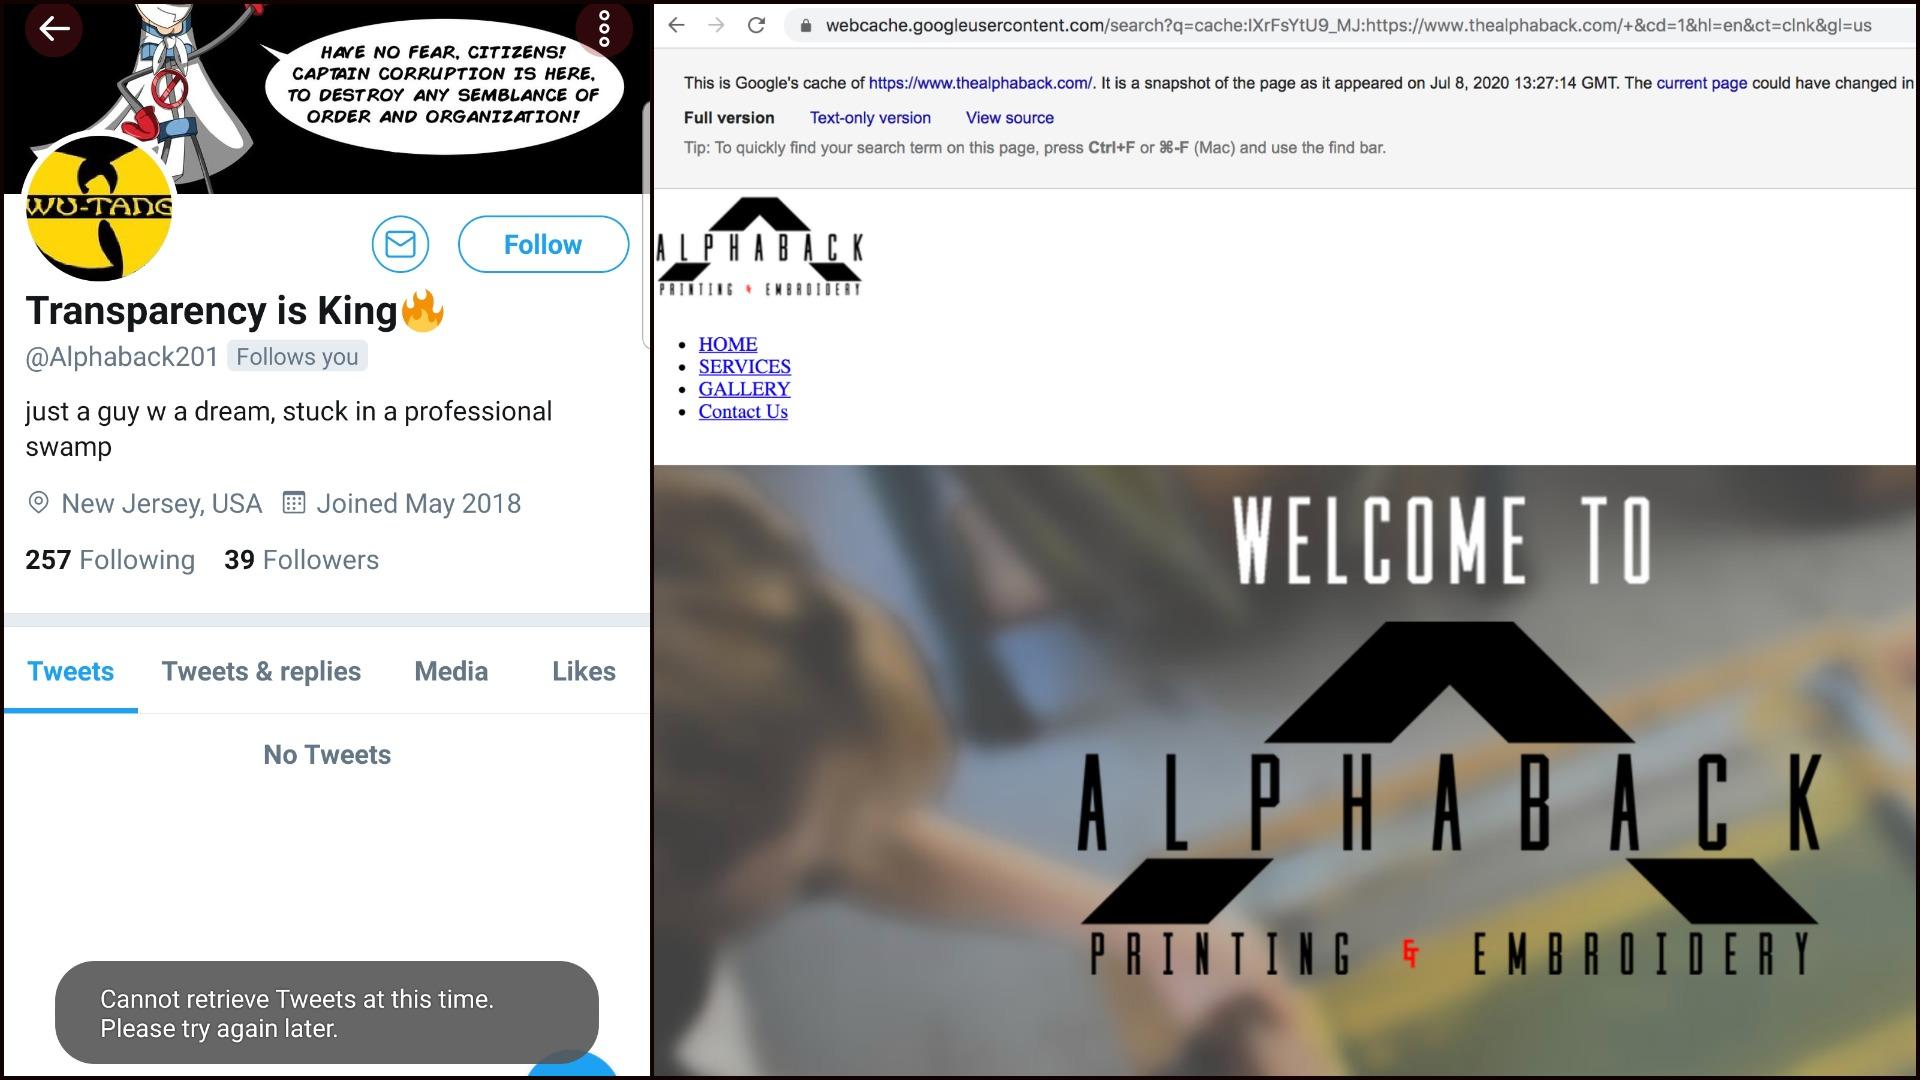 Alphaback201 - TheAlphaback - Erik Infantes